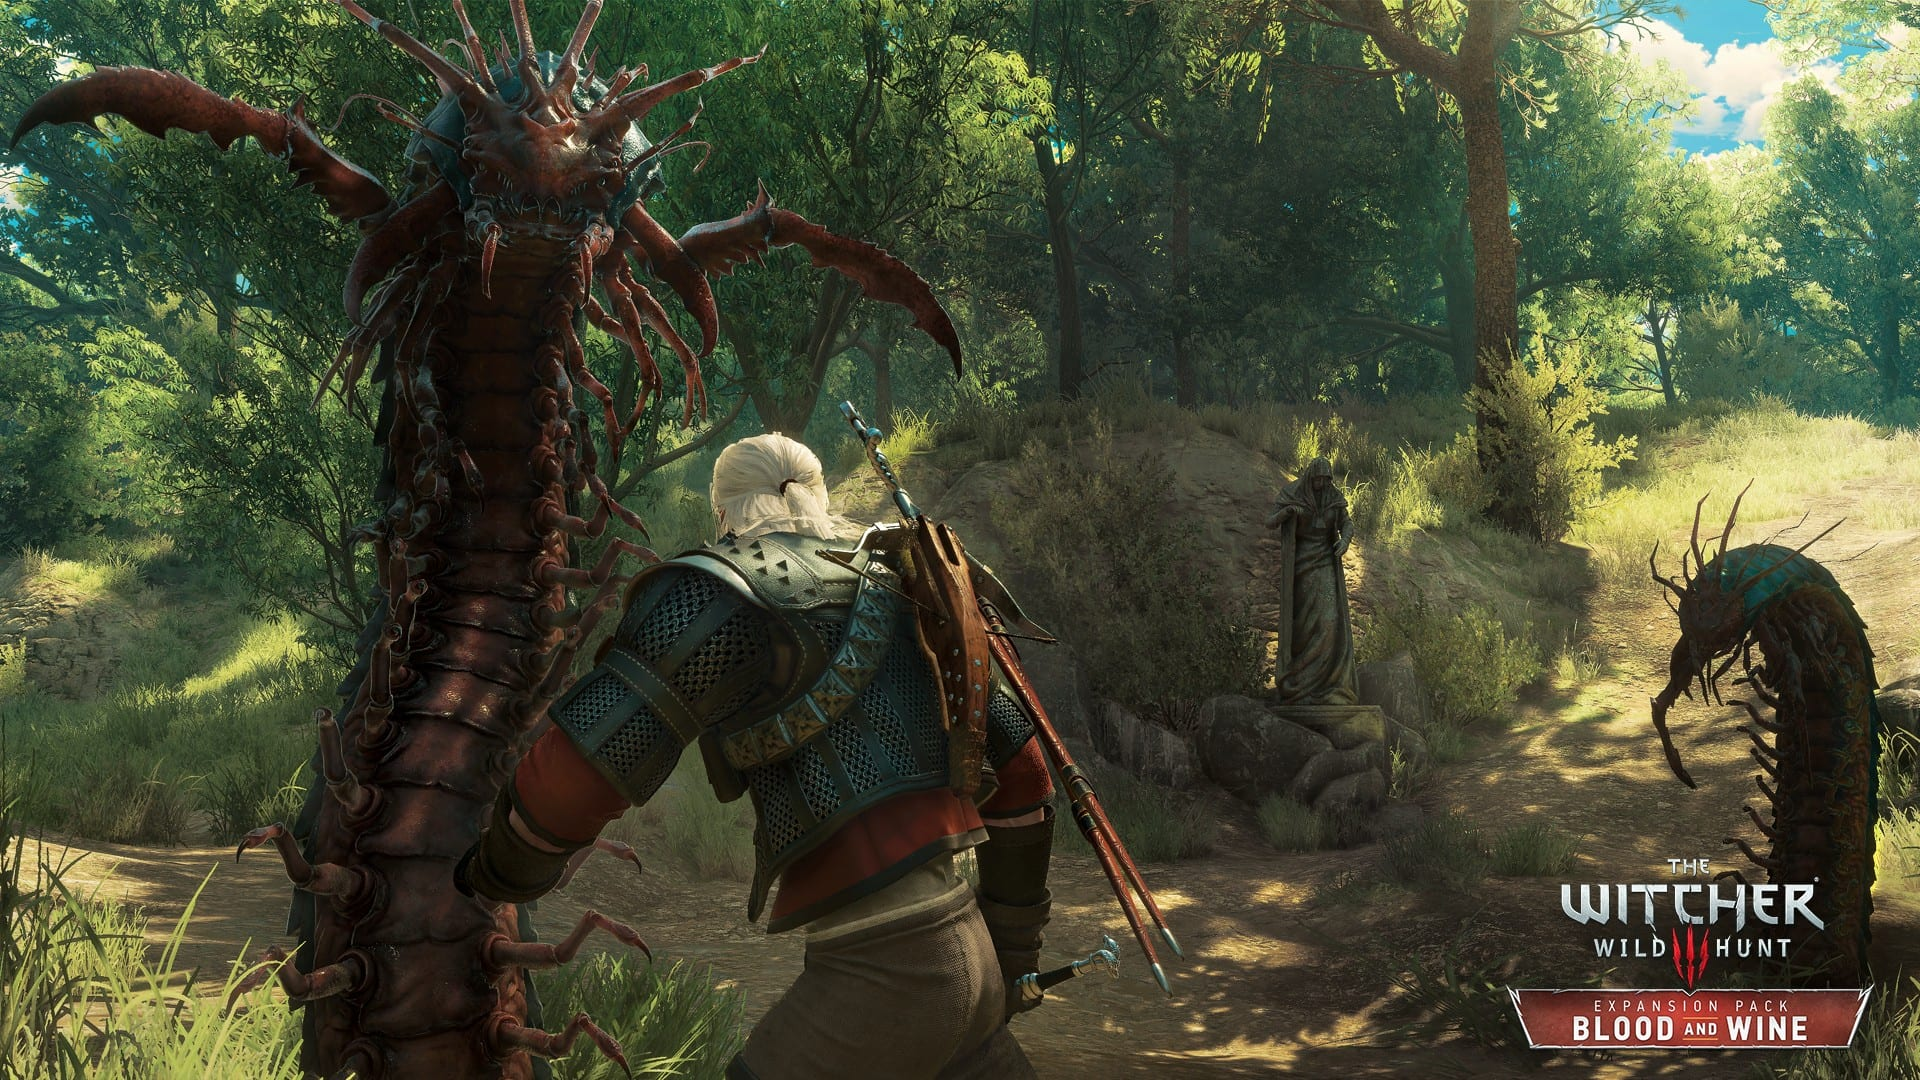 The Witcher 3: Wild Hunt, nuove immagini dell'espansione Blood and Wine 4